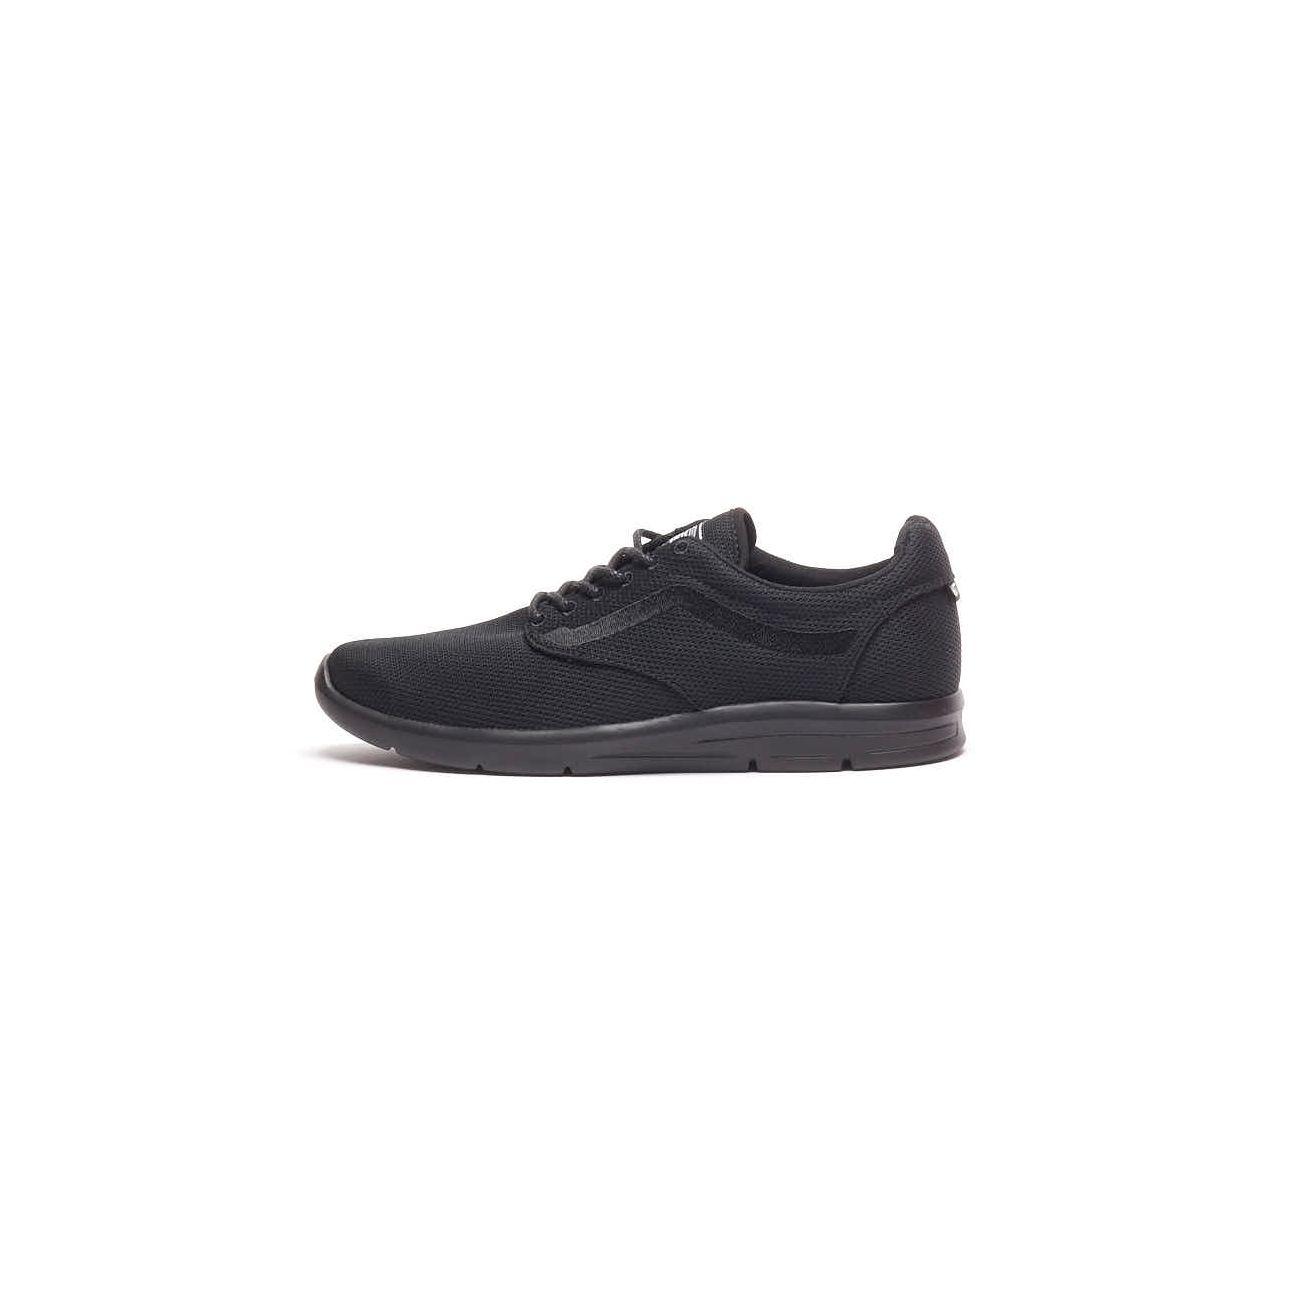 VANS VANS SNEAKER ISO 1.5 Man Mono Black   Mascheroni Sportswear